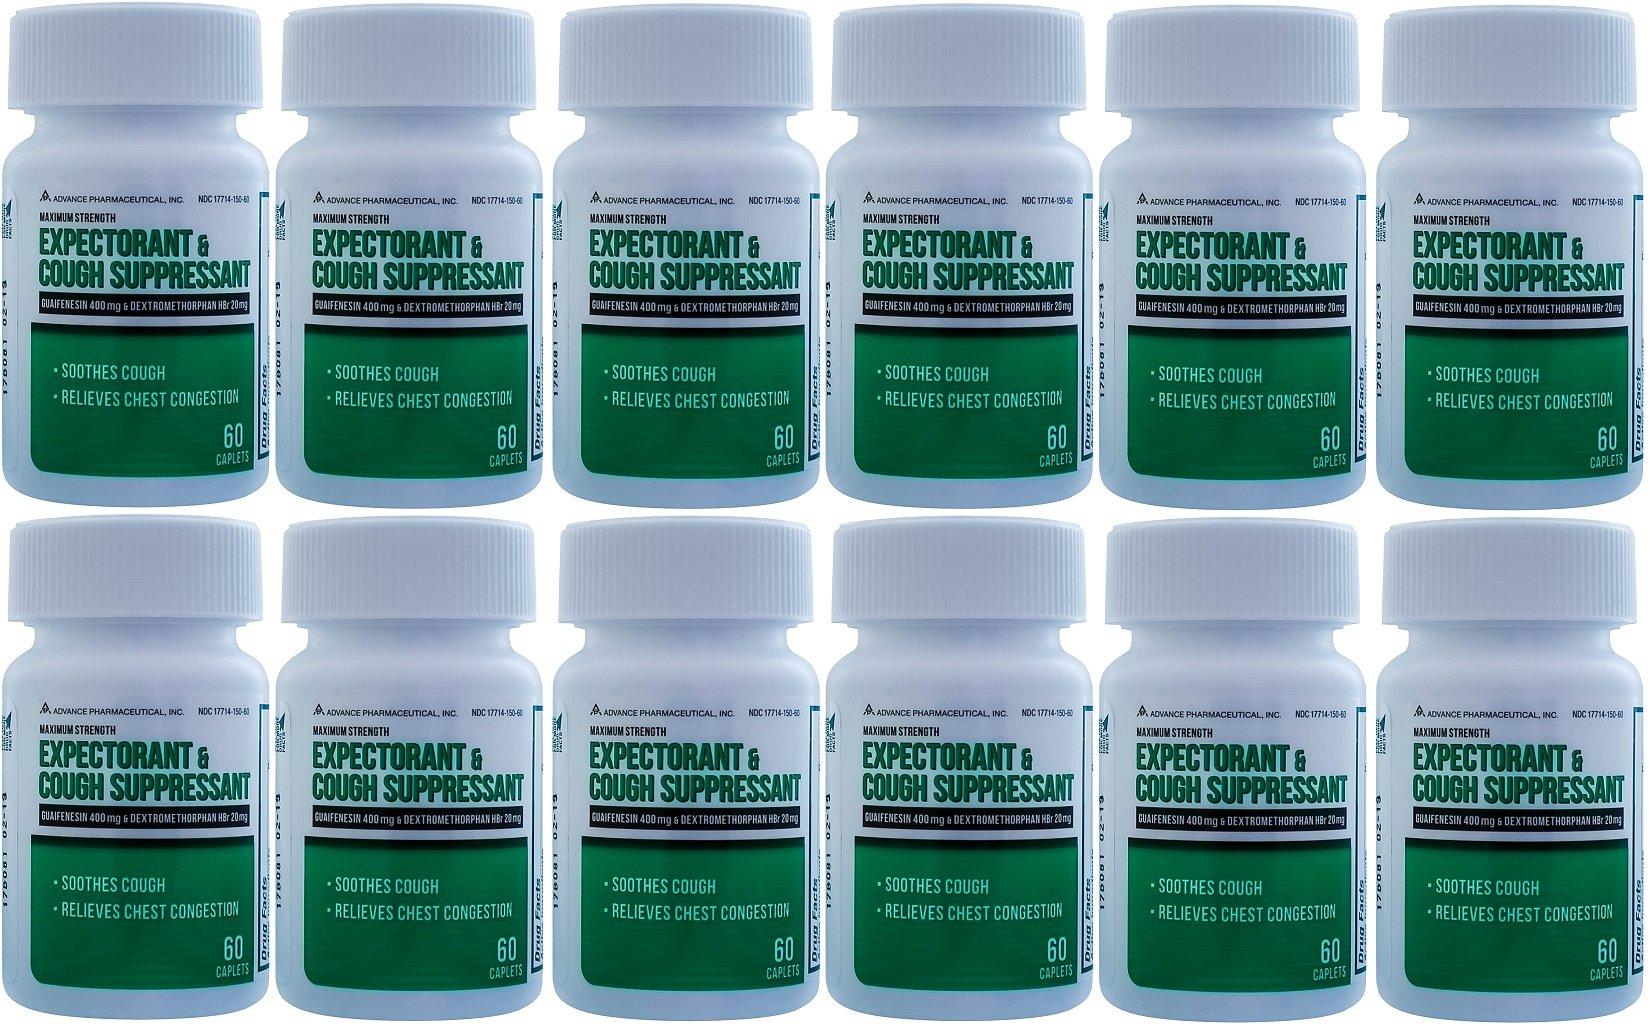 Mucus DM Expectorant Cough Suppressant 720 Caplets Generic DM Cough